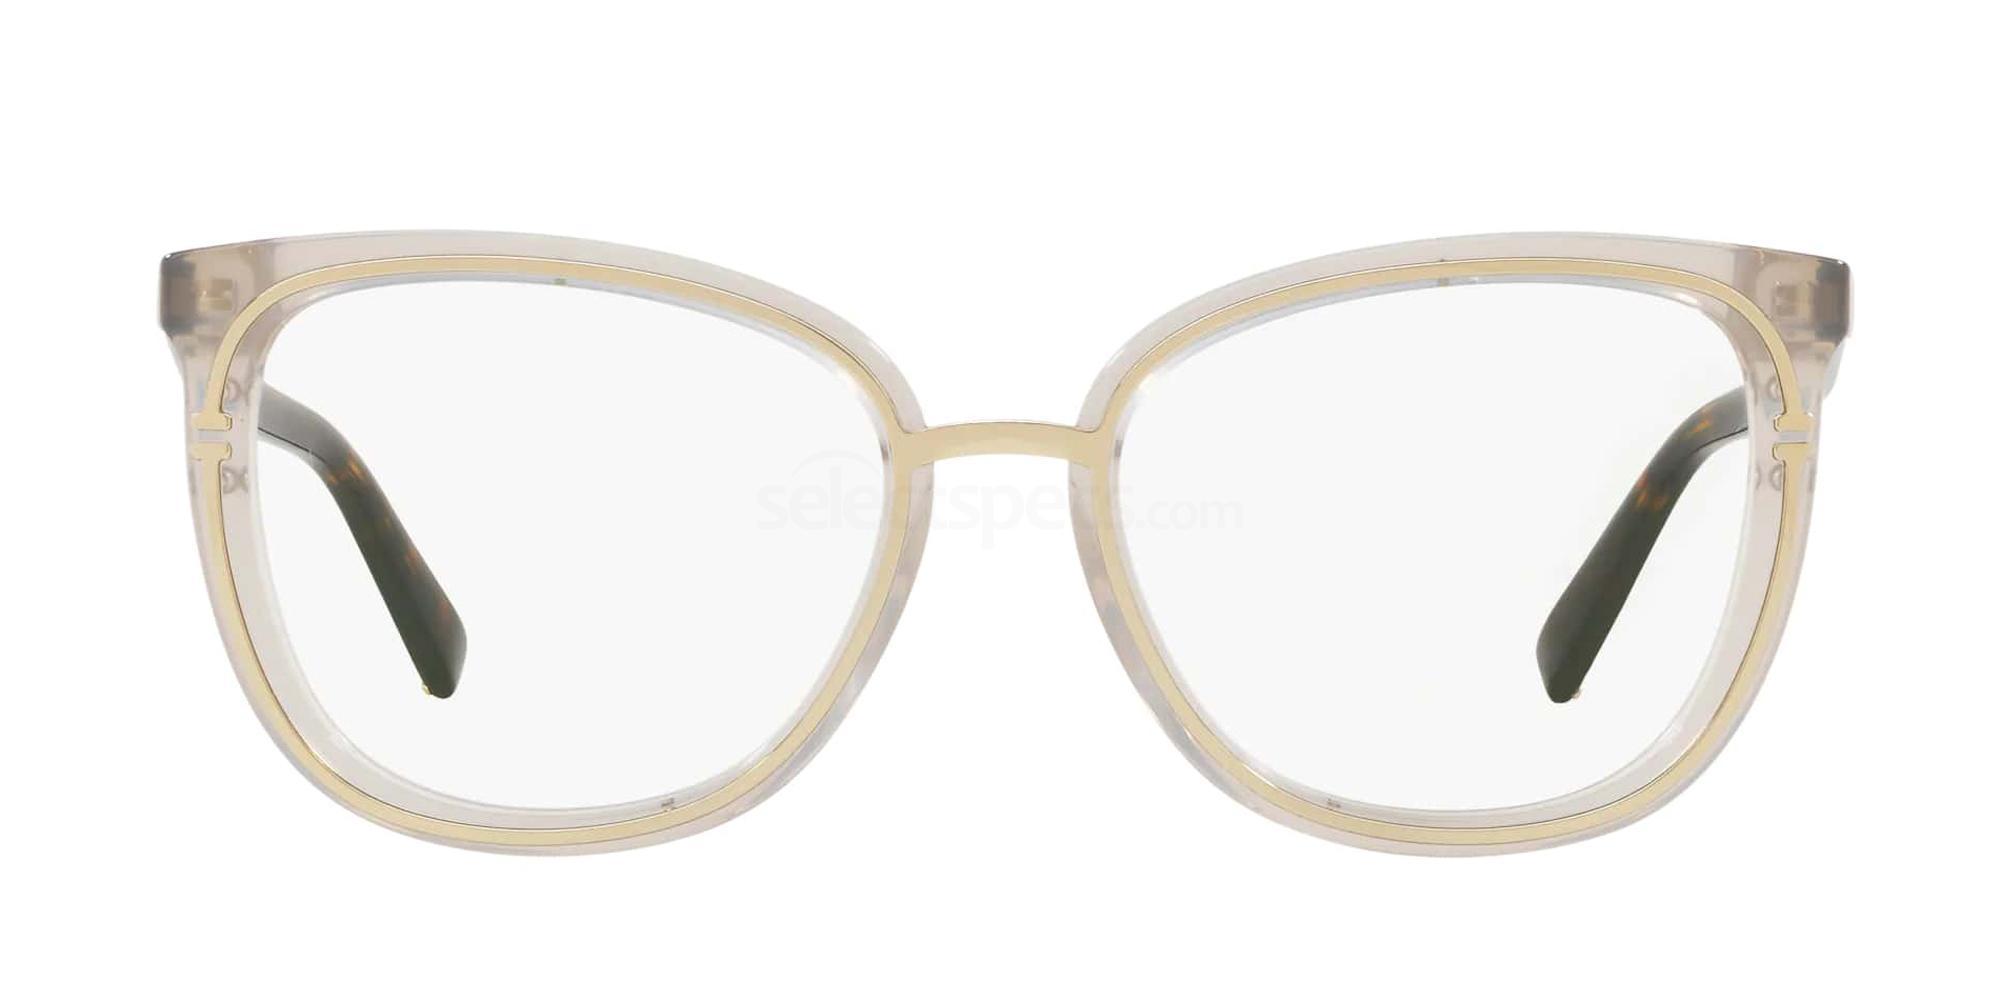 8250 TF2165 Glasses, Tiffany & Co.